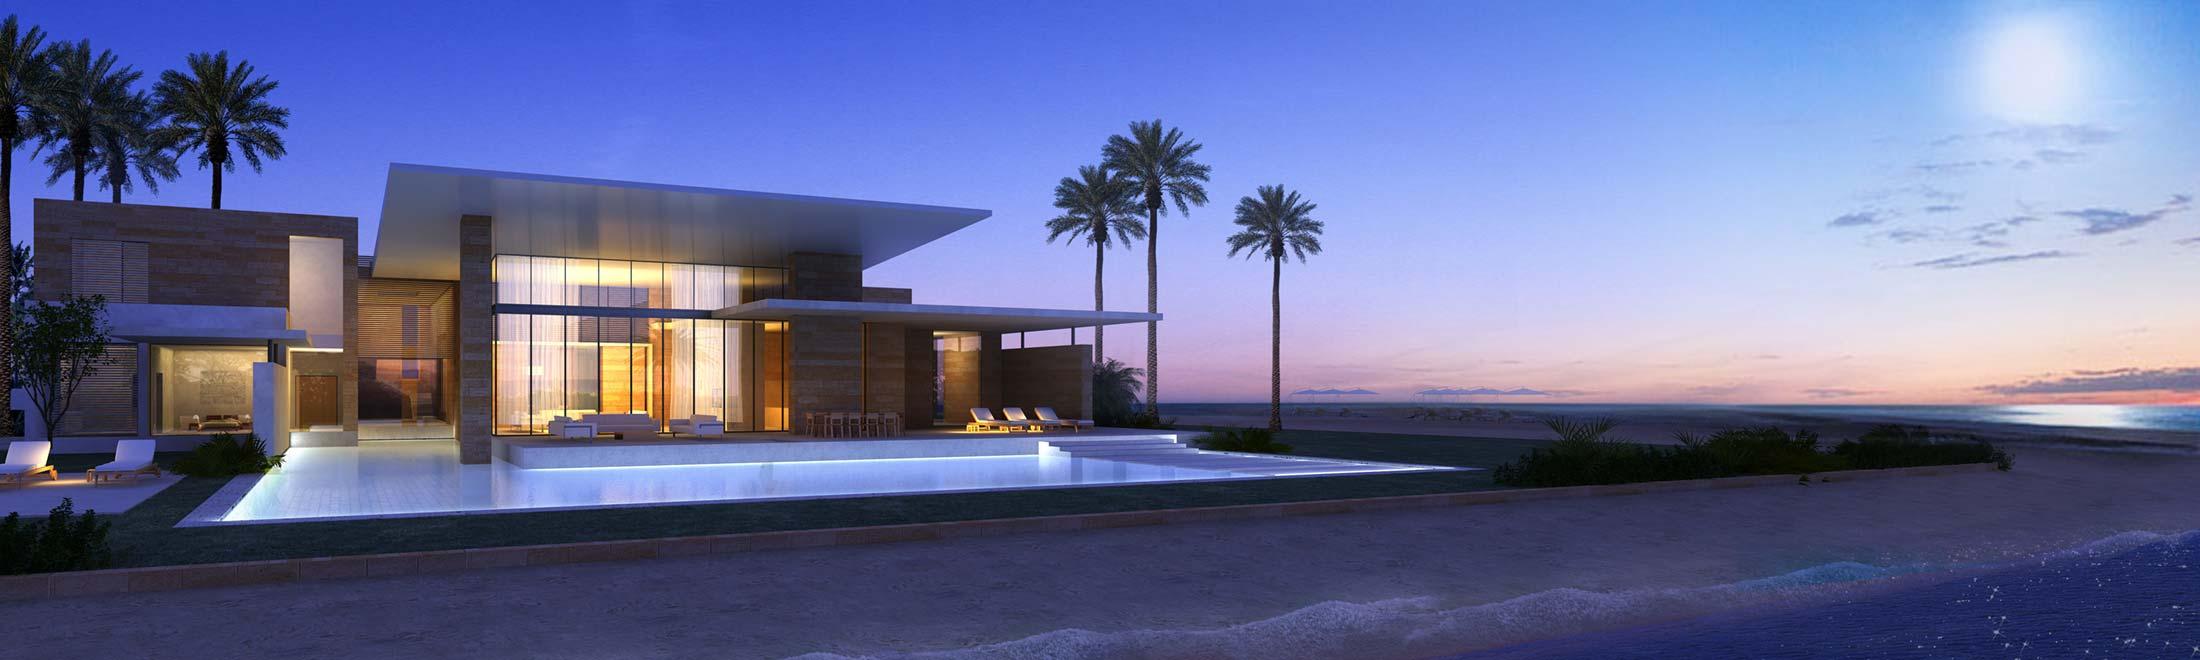 modern-architecture-residential-estate-uae-pool-water-shubindonaldson-dubai-villas-3